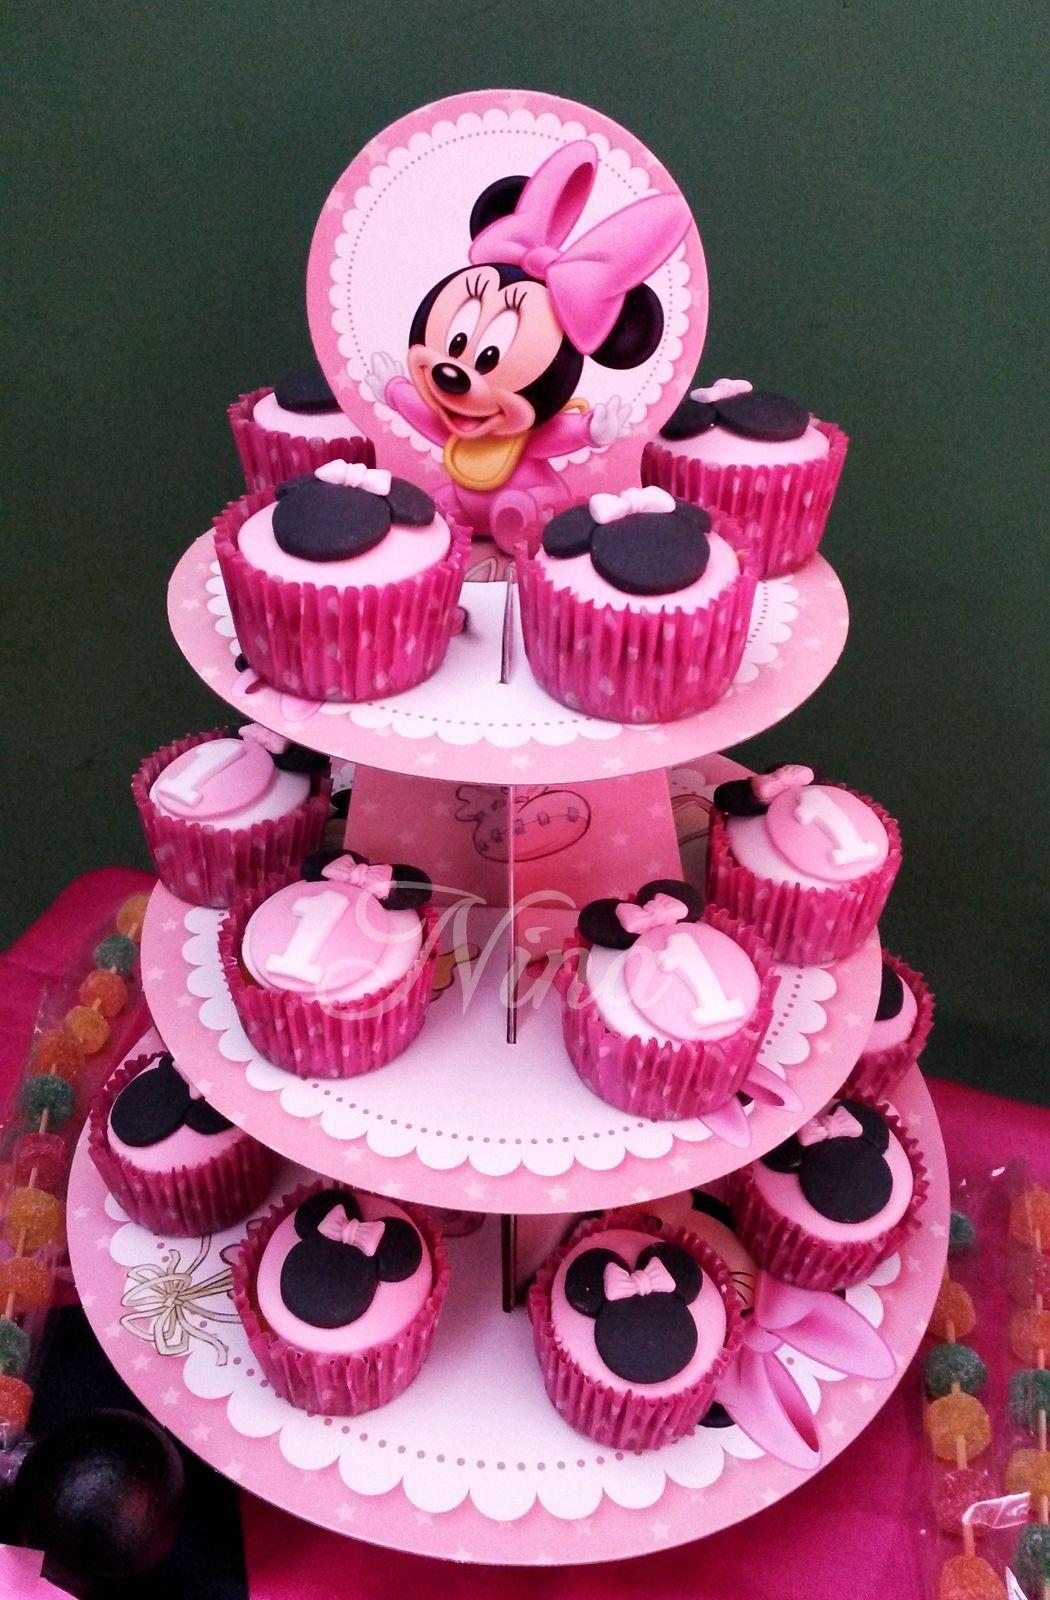 Nina By Lady Temática Minnie Bebé Cupcakes Decoradas Con